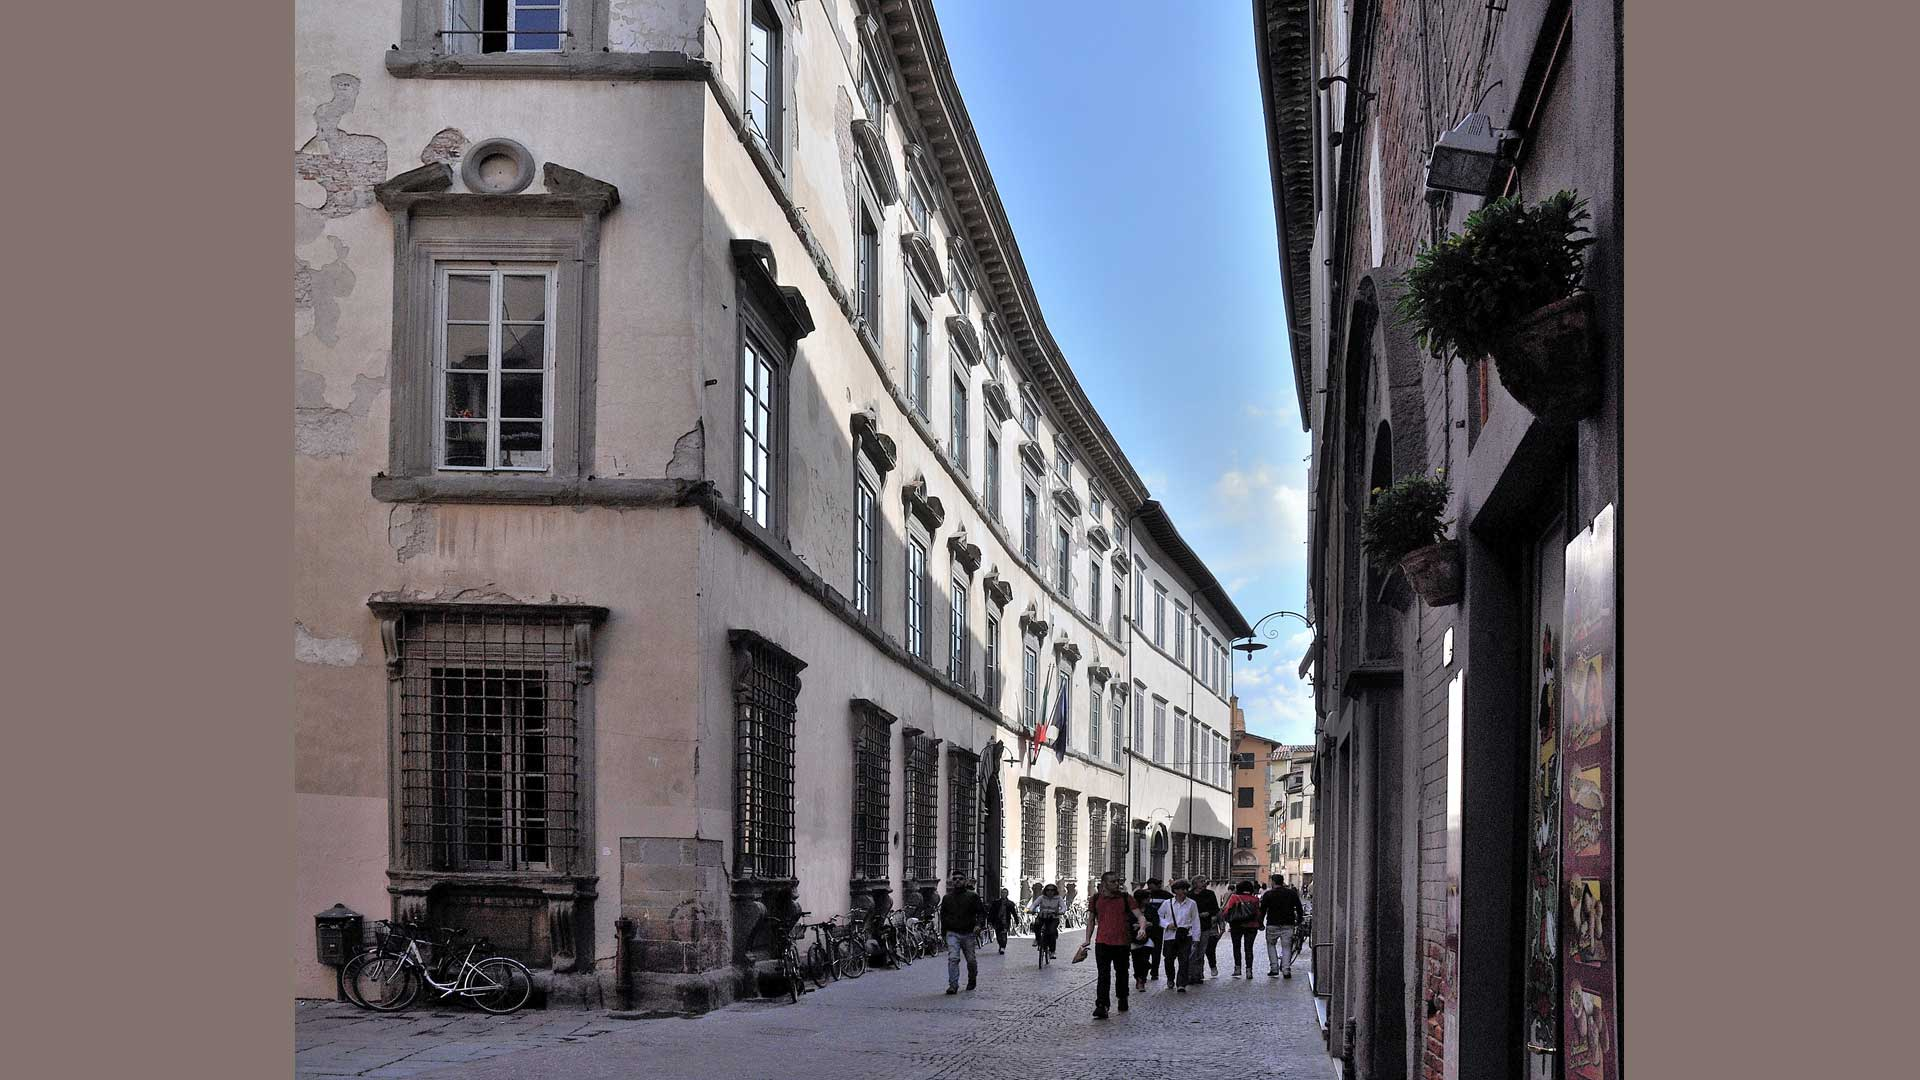 Palazzo Buonvisi